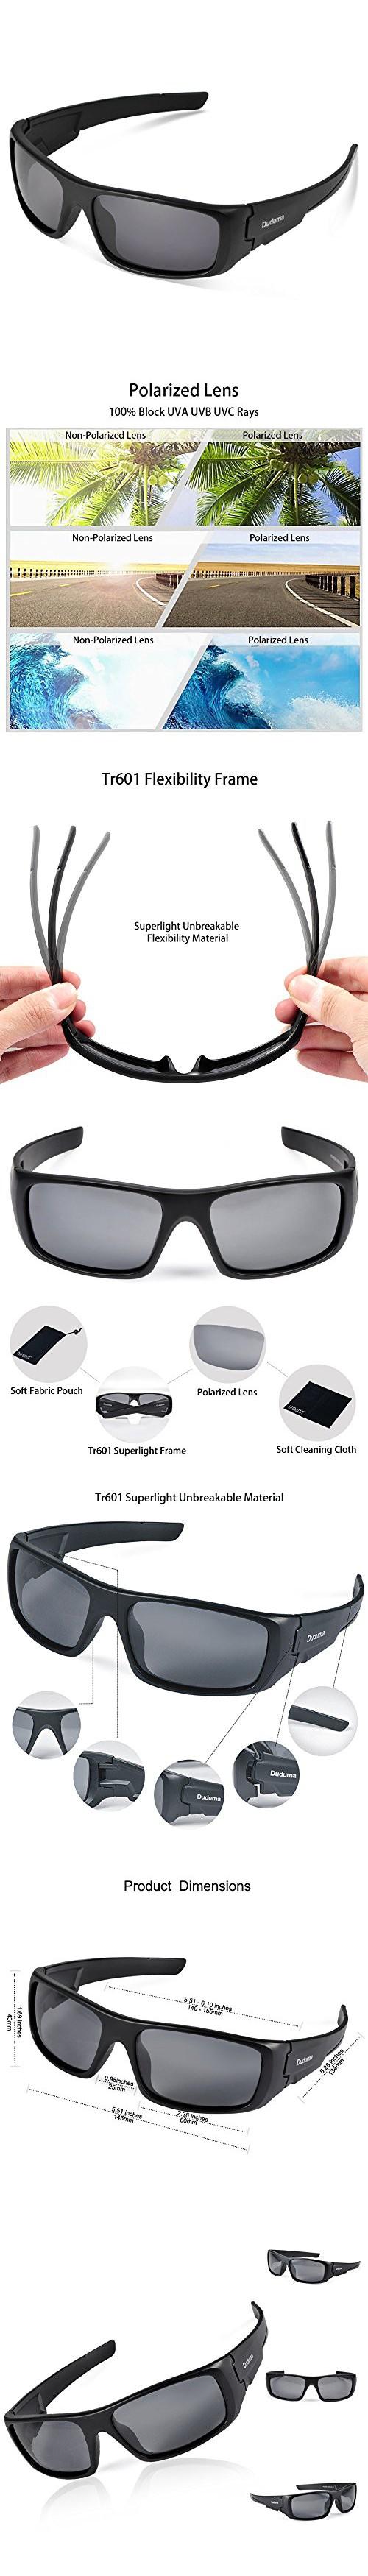 c84b986206 Duduma Tr601 Polarized Sports Sunglasses for Baseball Cycling Fishing Golf  Superlight Frame (black frame